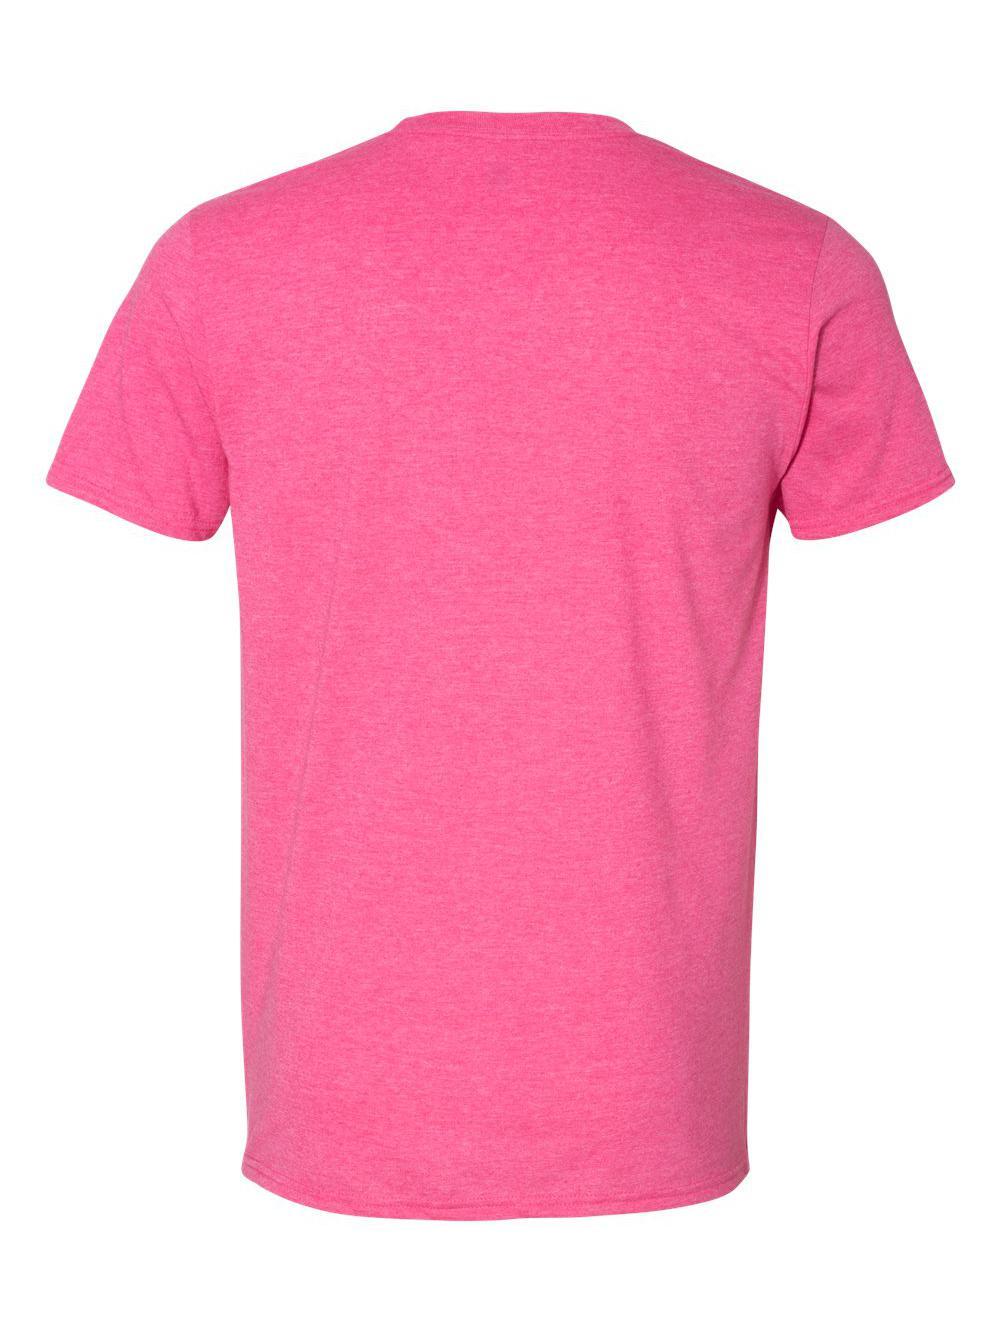 Gildan-Softstyle-T-Shirt-64000 thumbnail 67